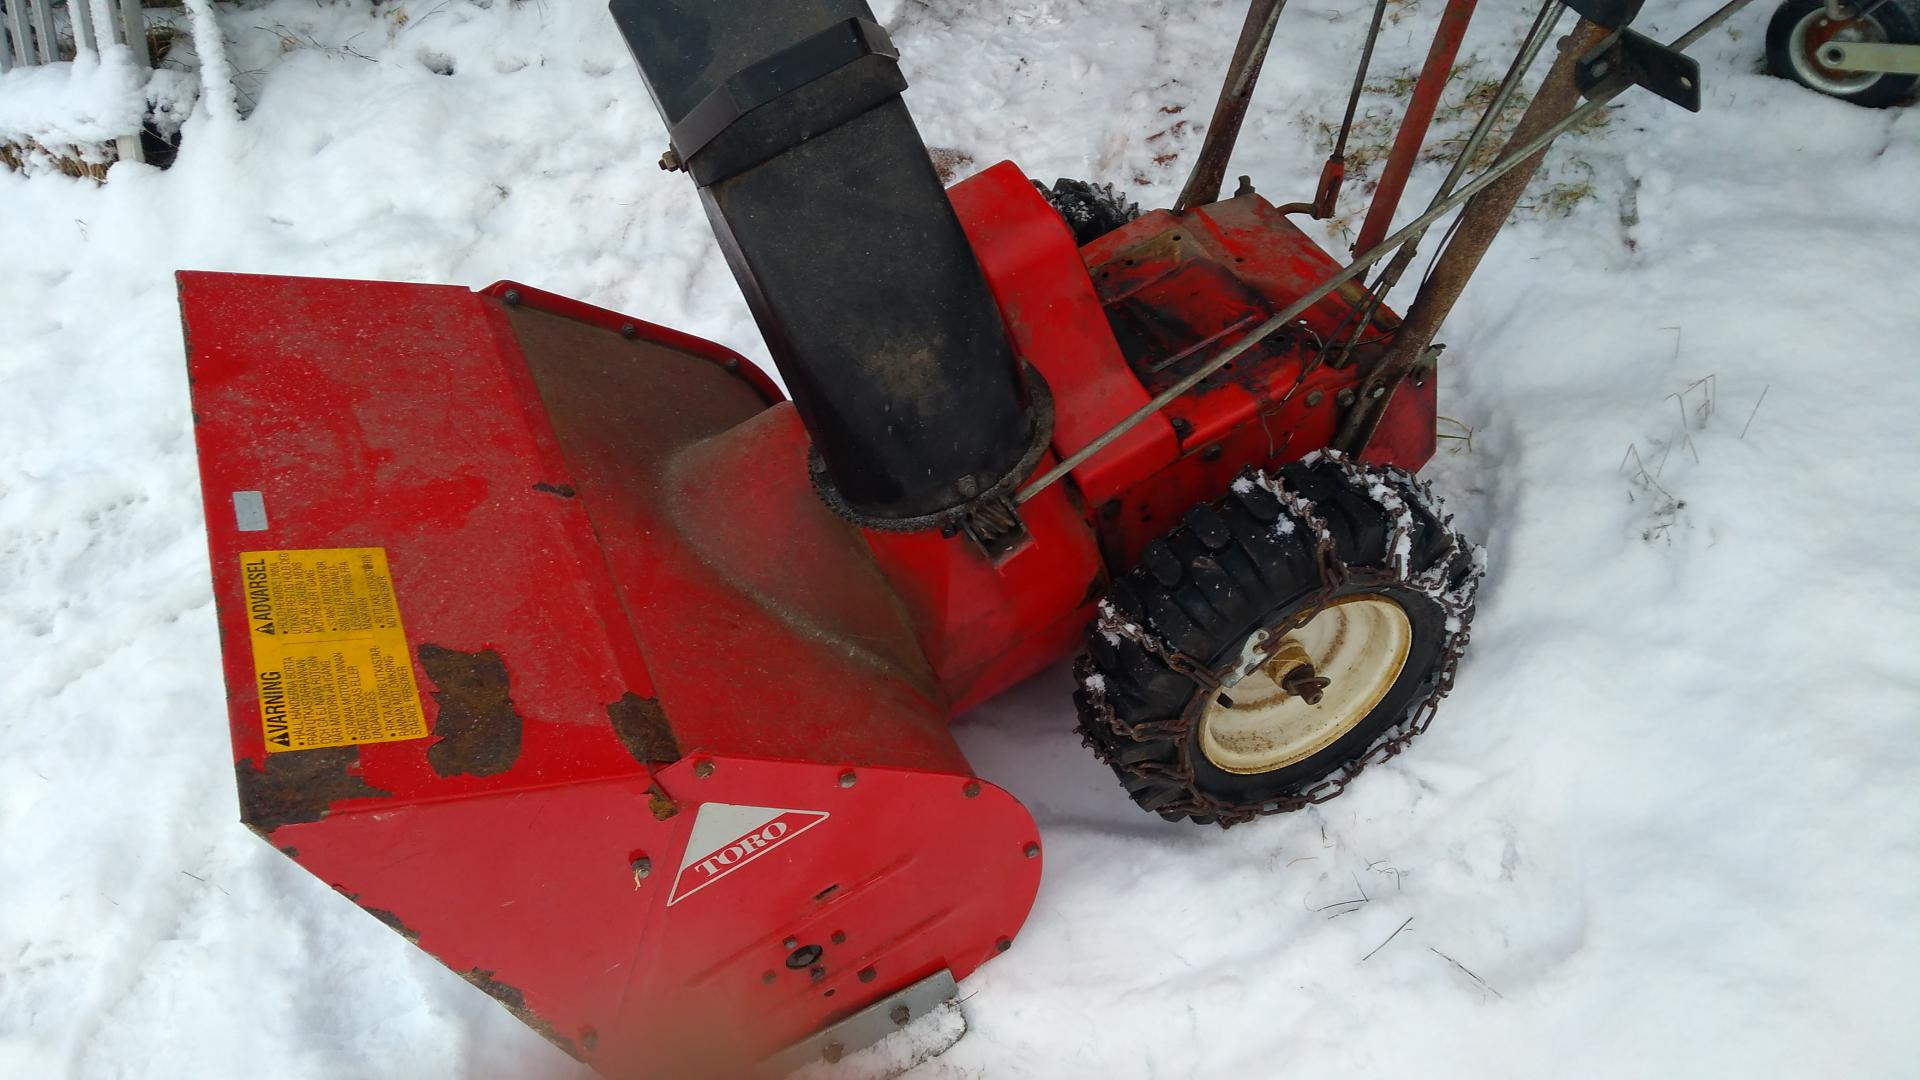 old 826 with new subaru engine - Snowblower Forum : Snow